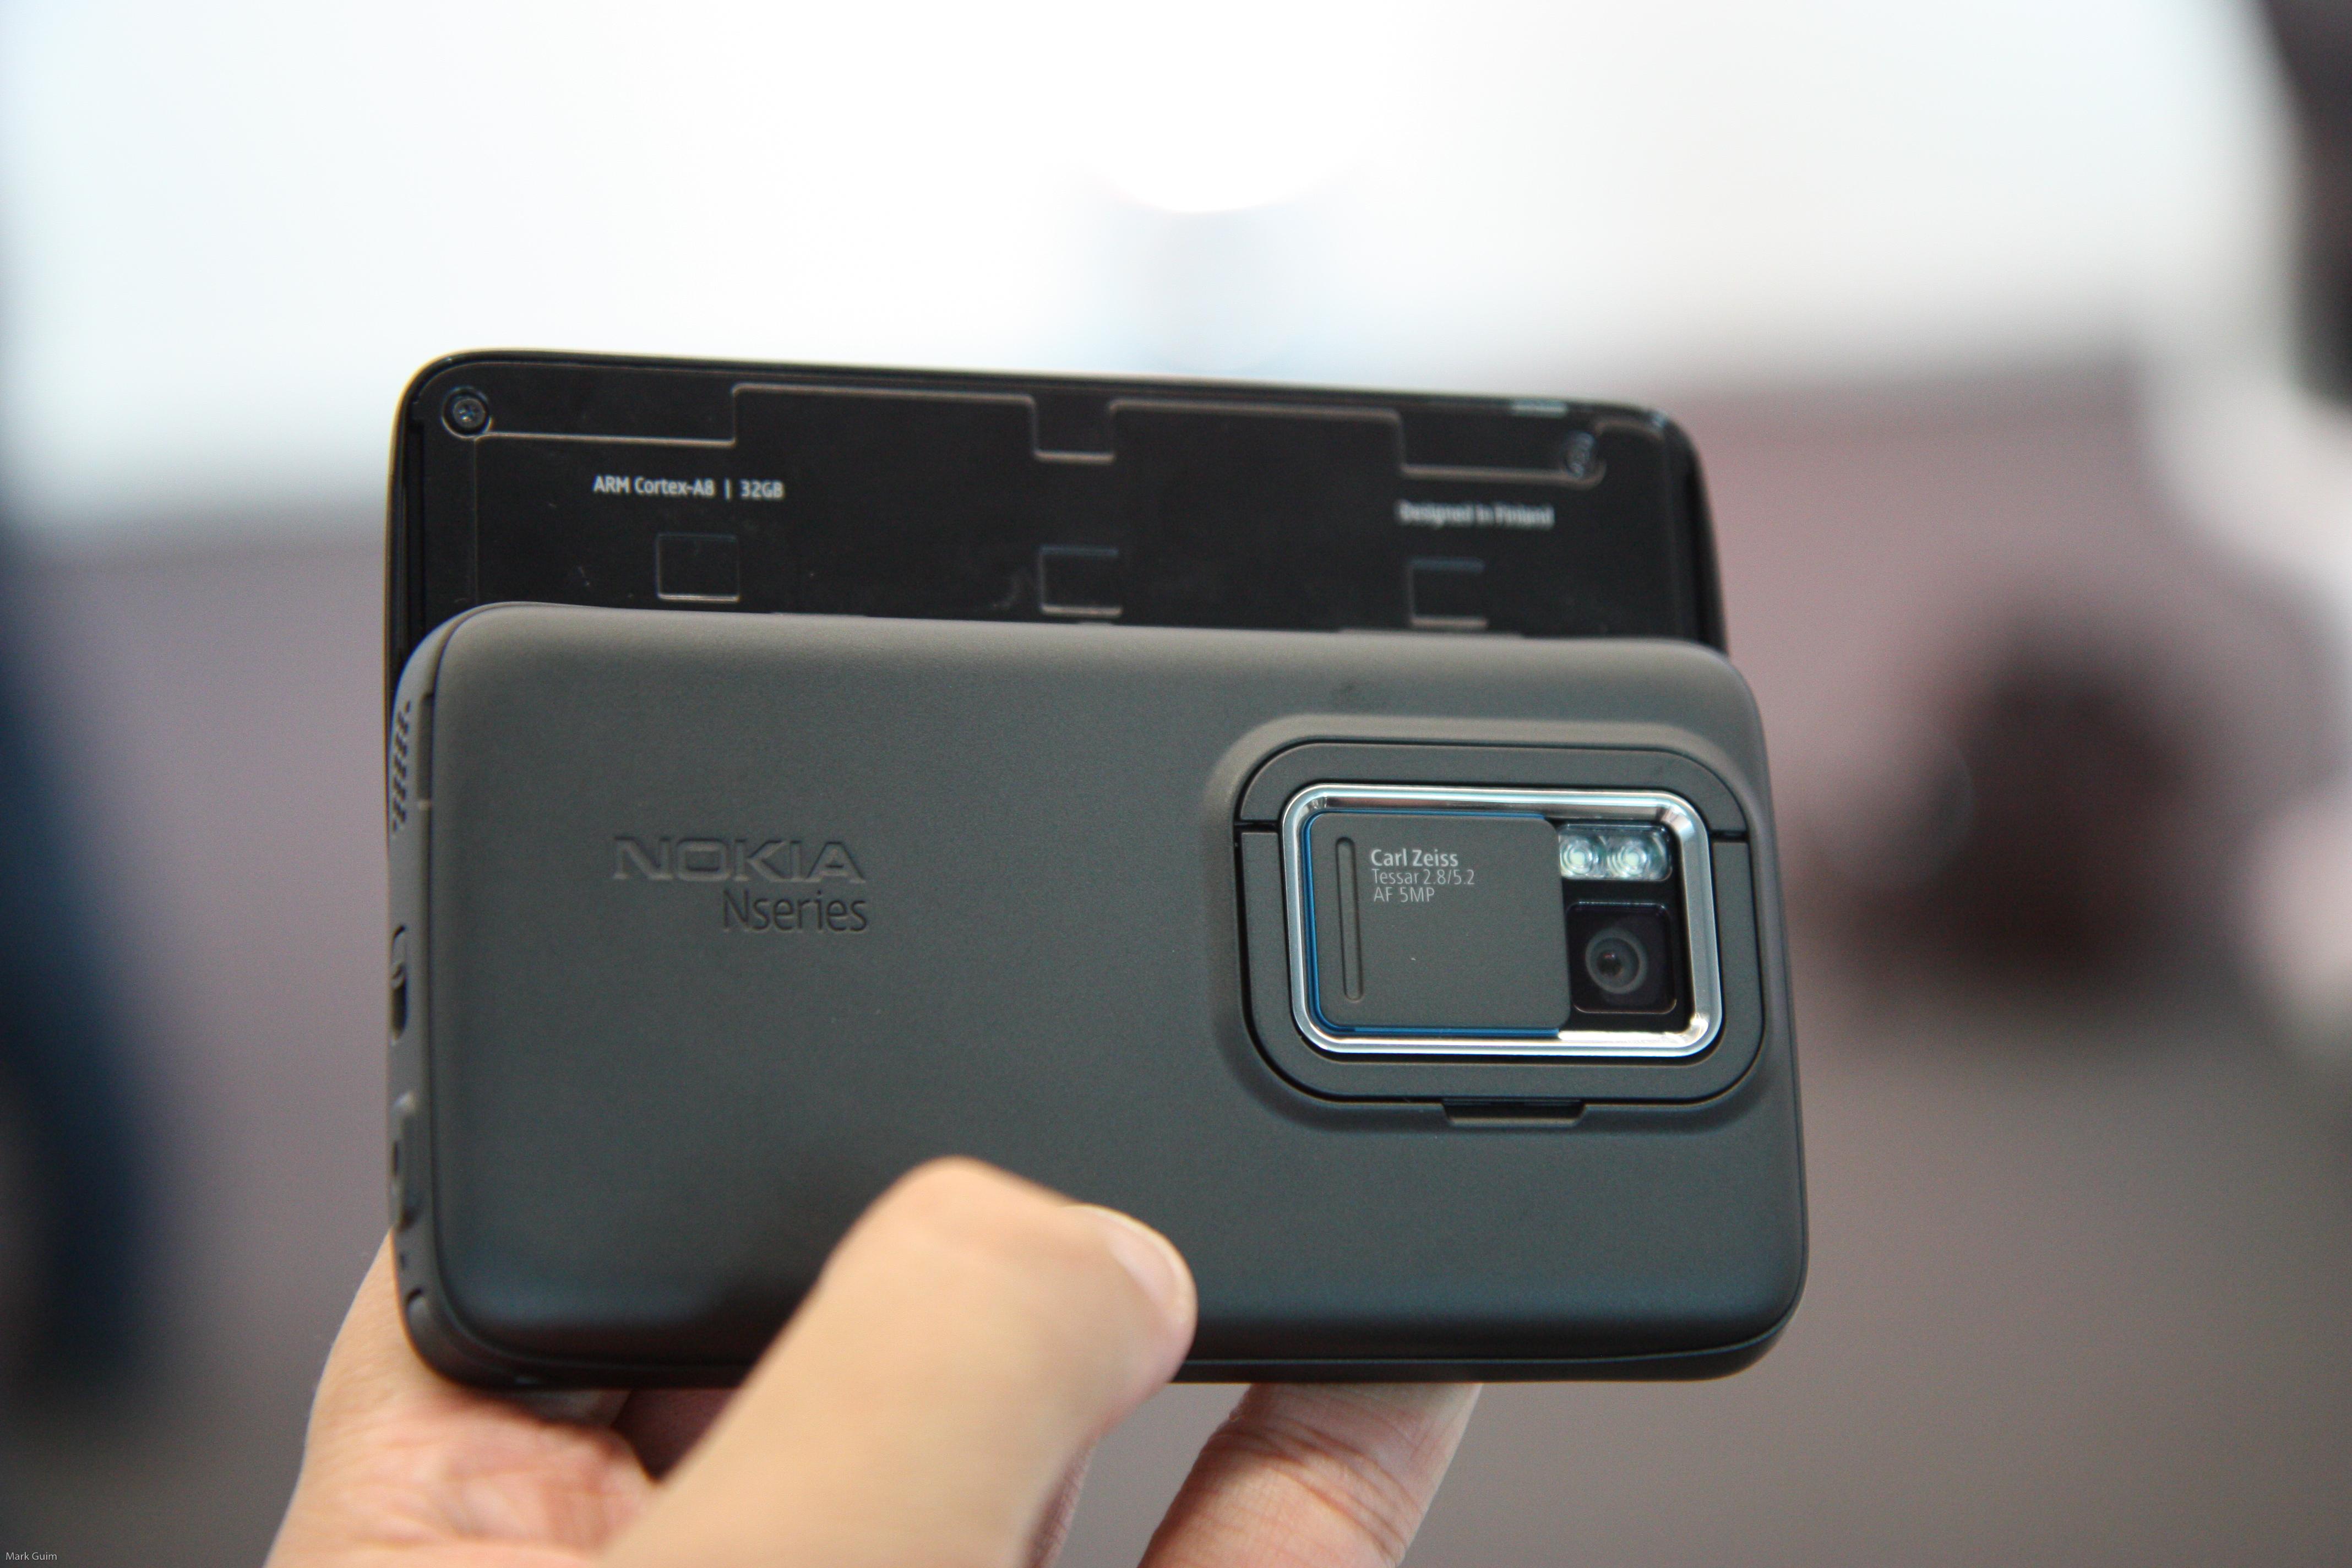 Nokia N900 showing up live on Twitter   SlashGear